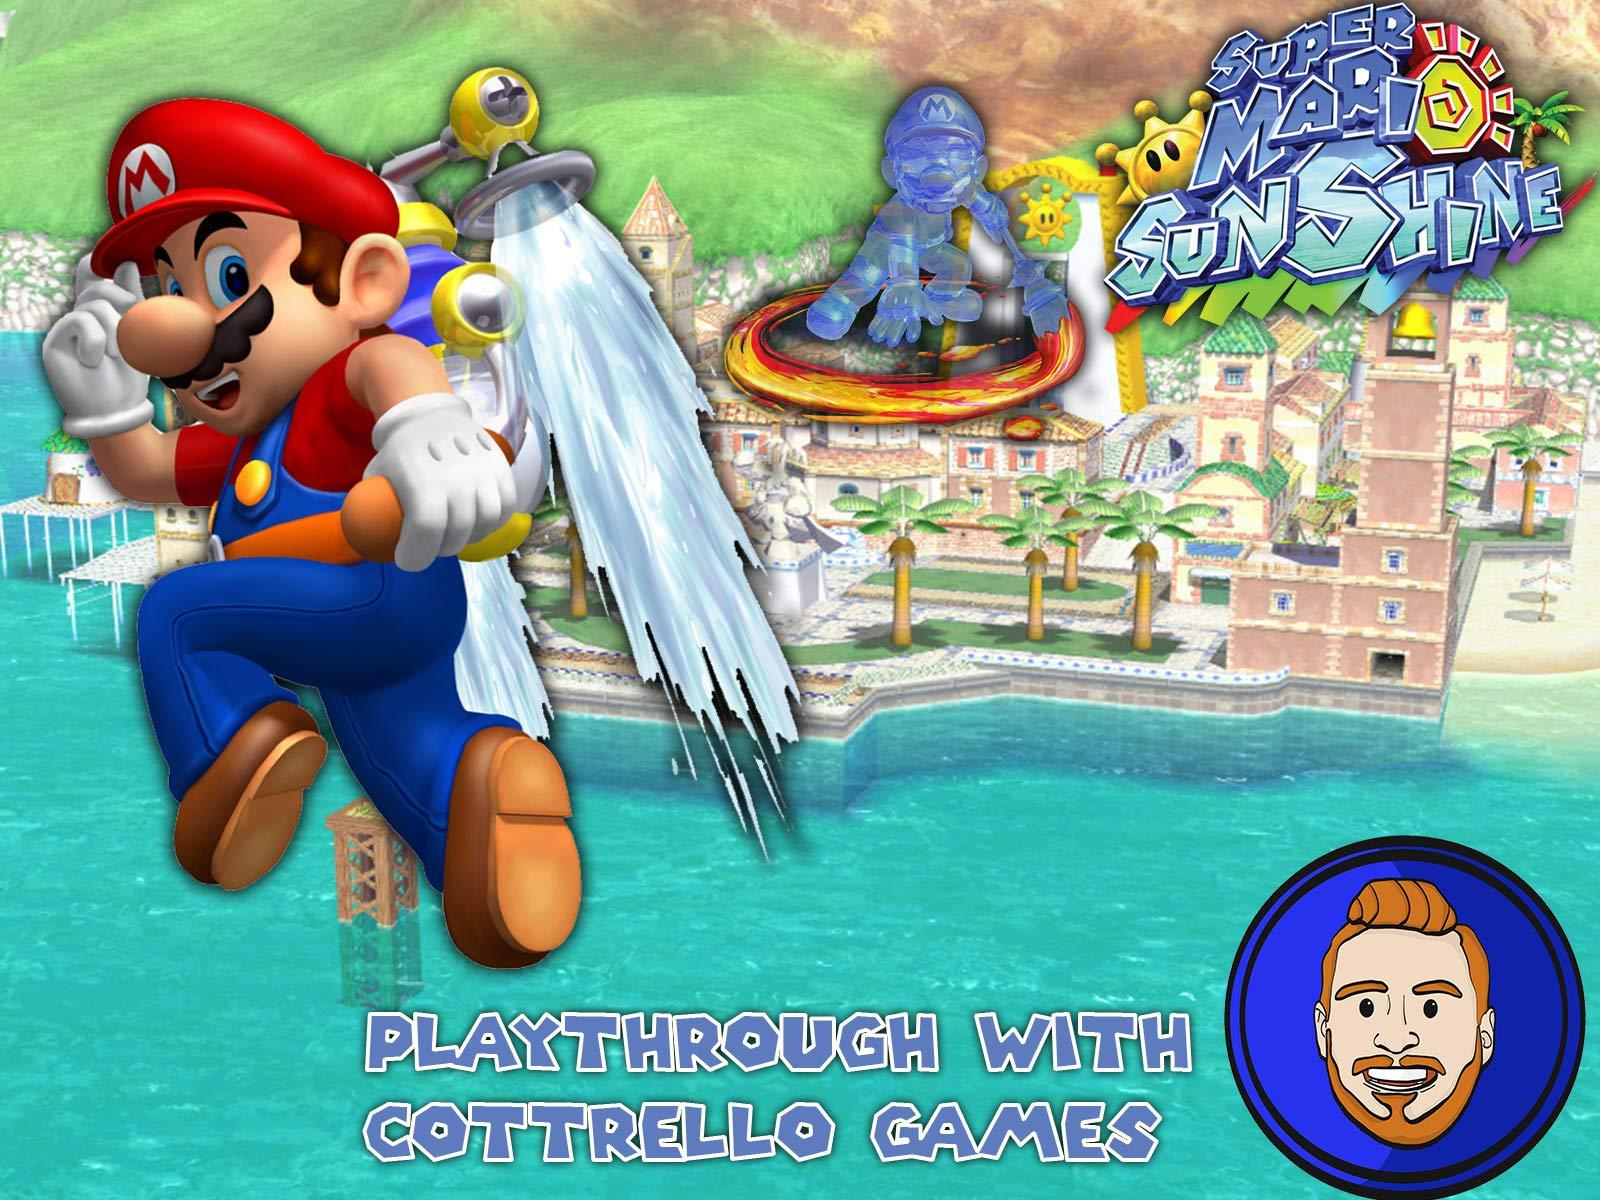 Super Mario Sunshine Playthrough with Cottrello Games on Amazon Prime Instant Video UK